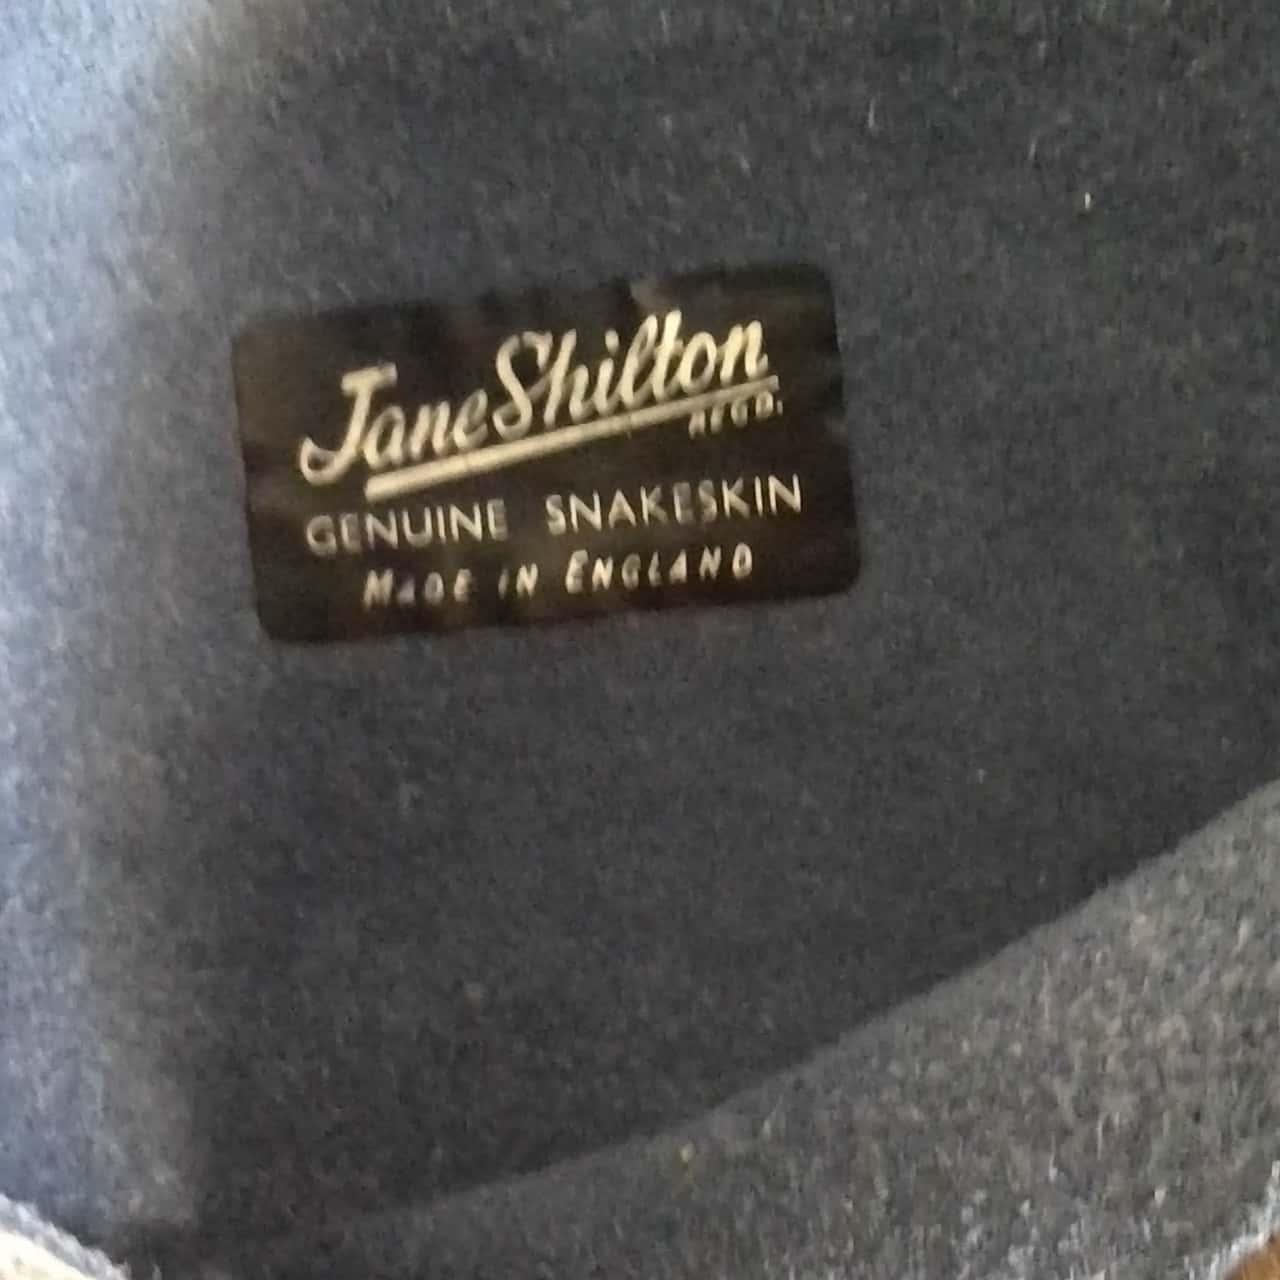 Womens VINTAGE JANE SHILTON 'SNAKE SKIN' CLUTCH PURSE Light Brown